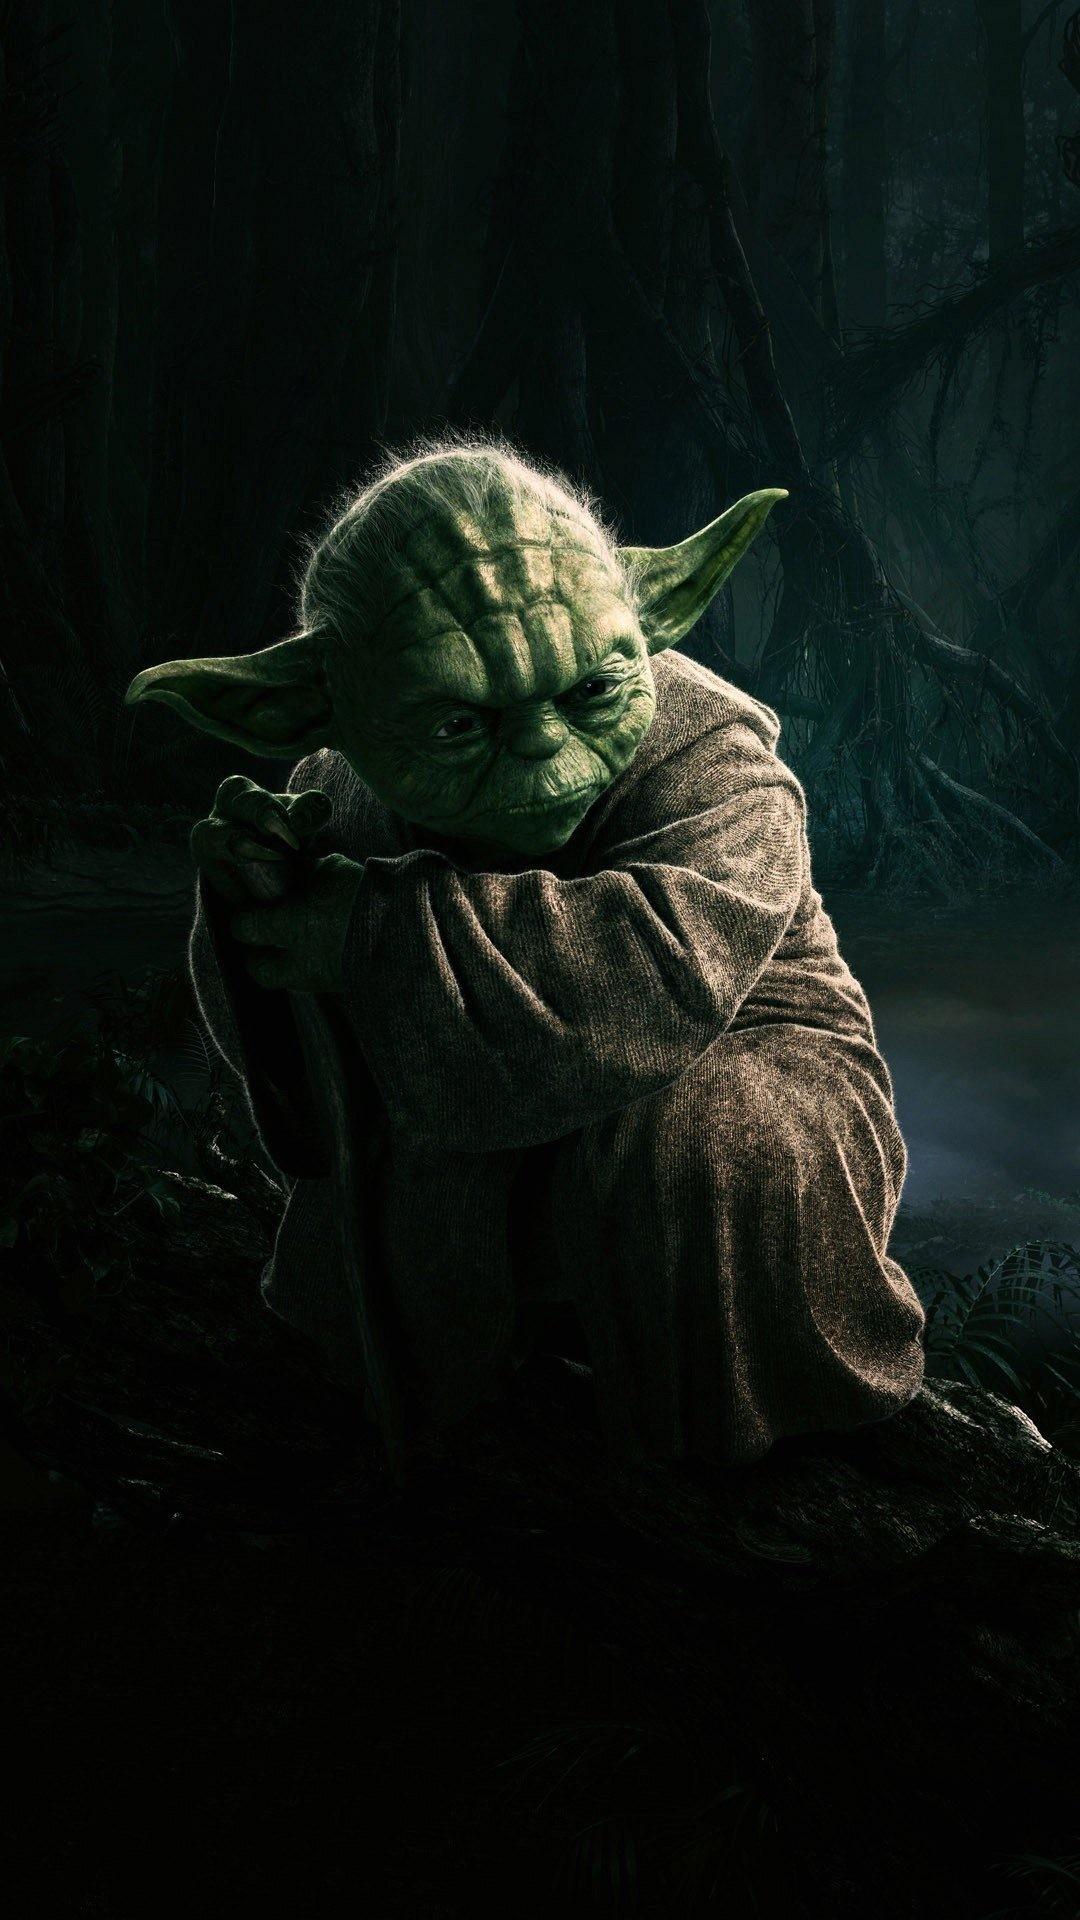 … hd yoda ilration star wars android wallpaper free download …